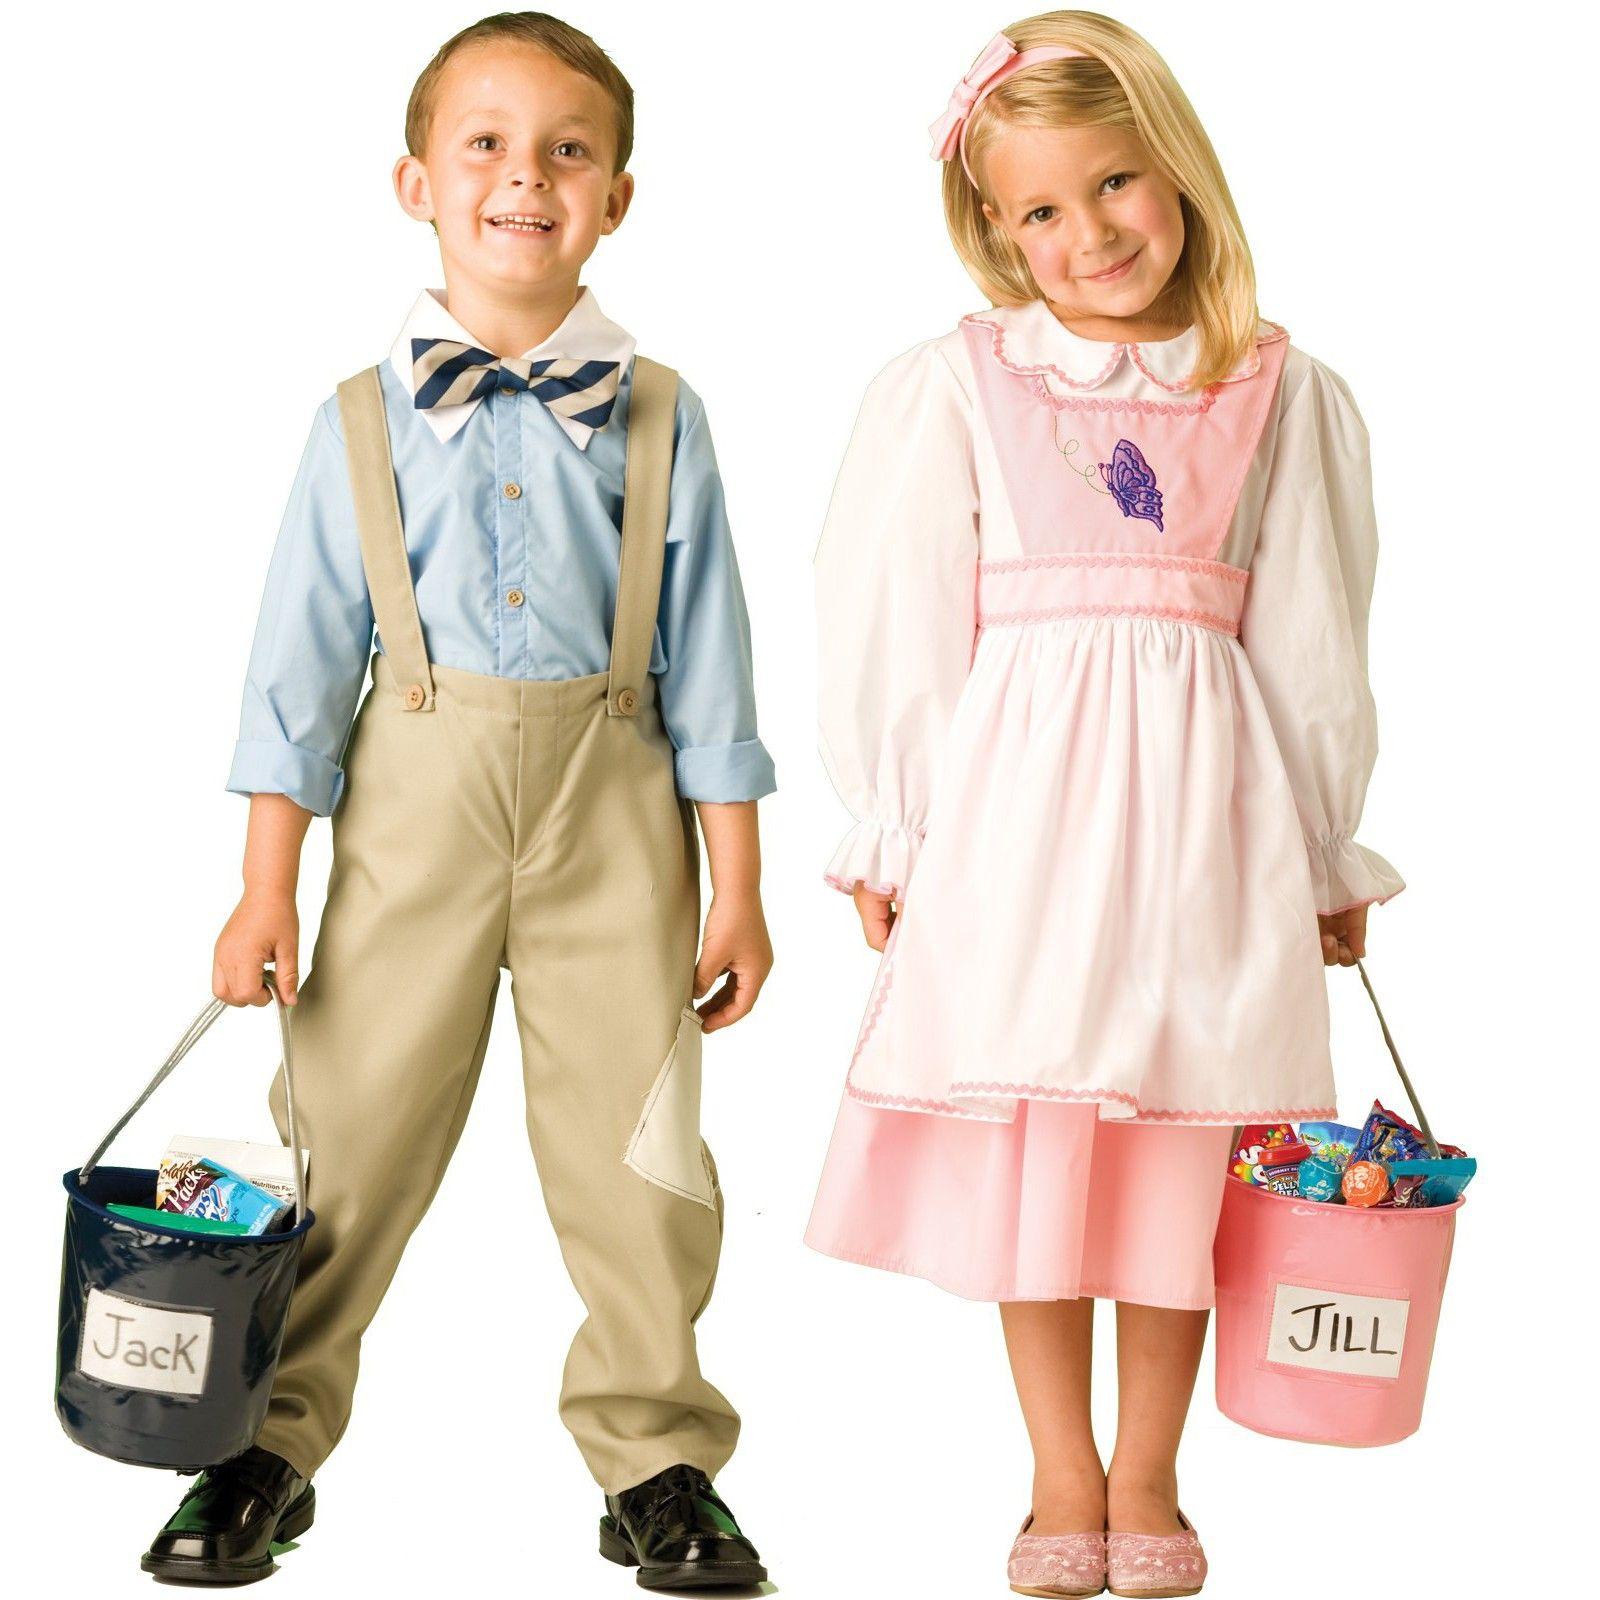 Boys Girls Wee Willie Winkie Ebenezer Scrooge Fancy Dress Up Costume Book Week